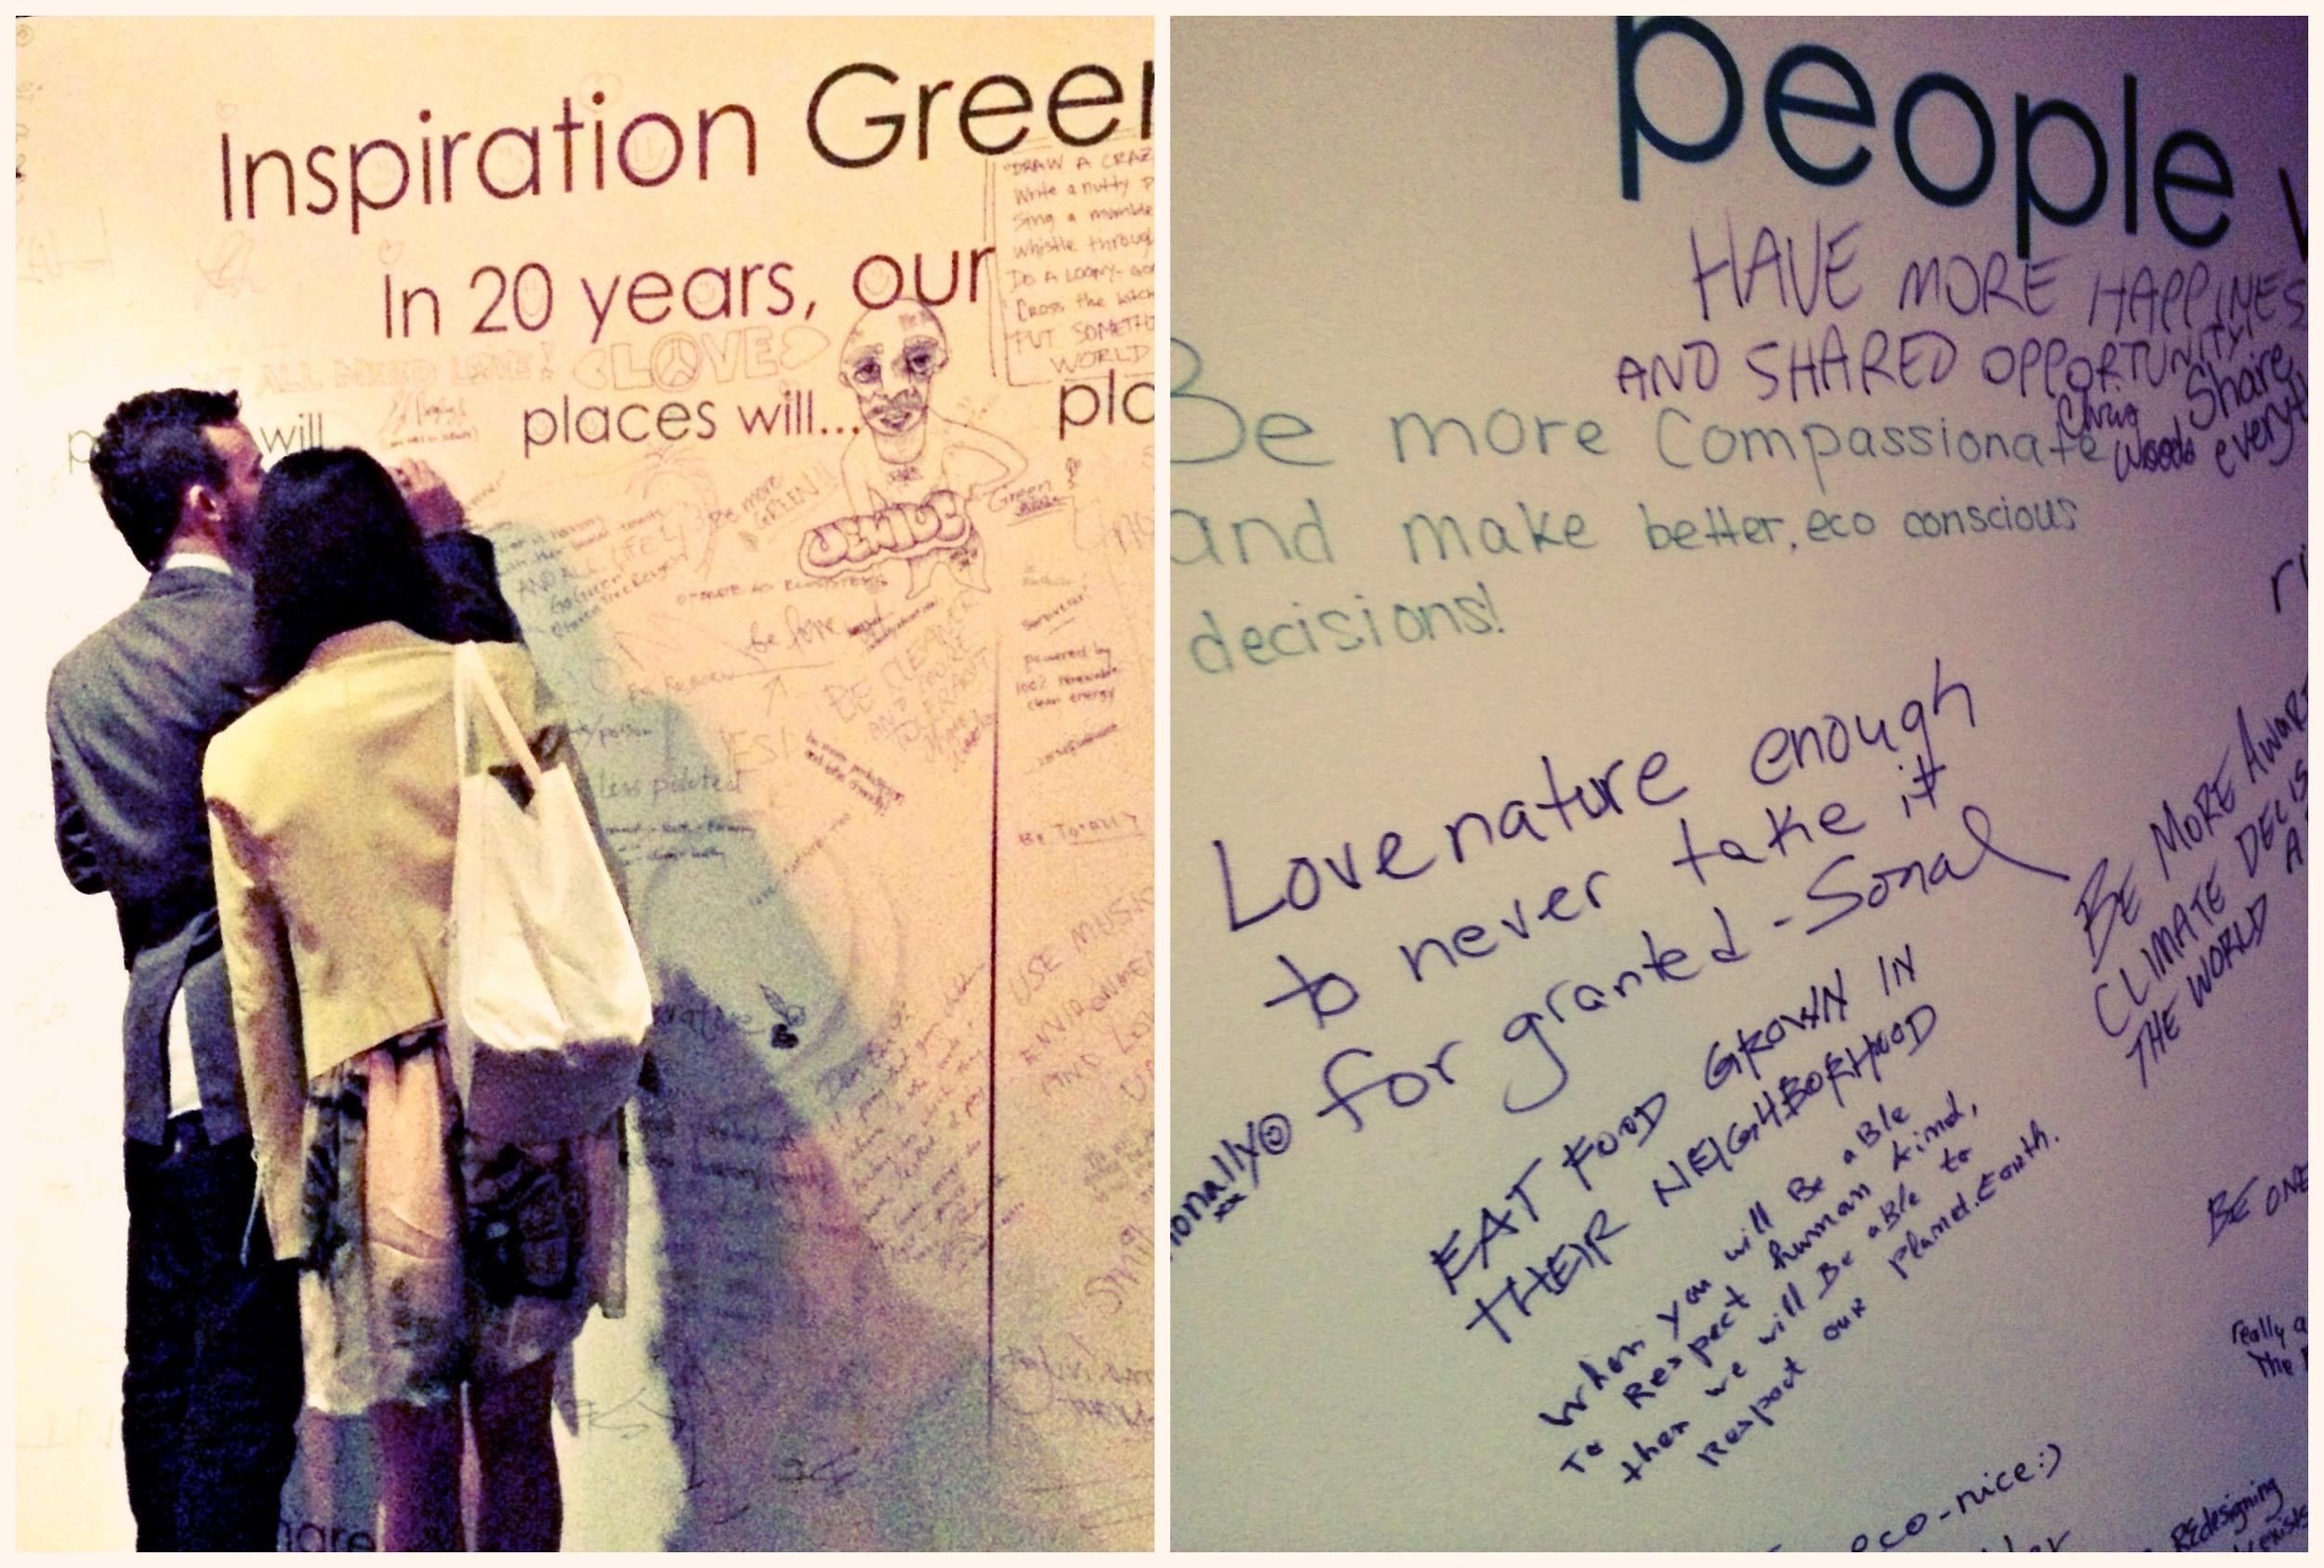 Global Green USA Pre-Oscar Party Inspiration Wall